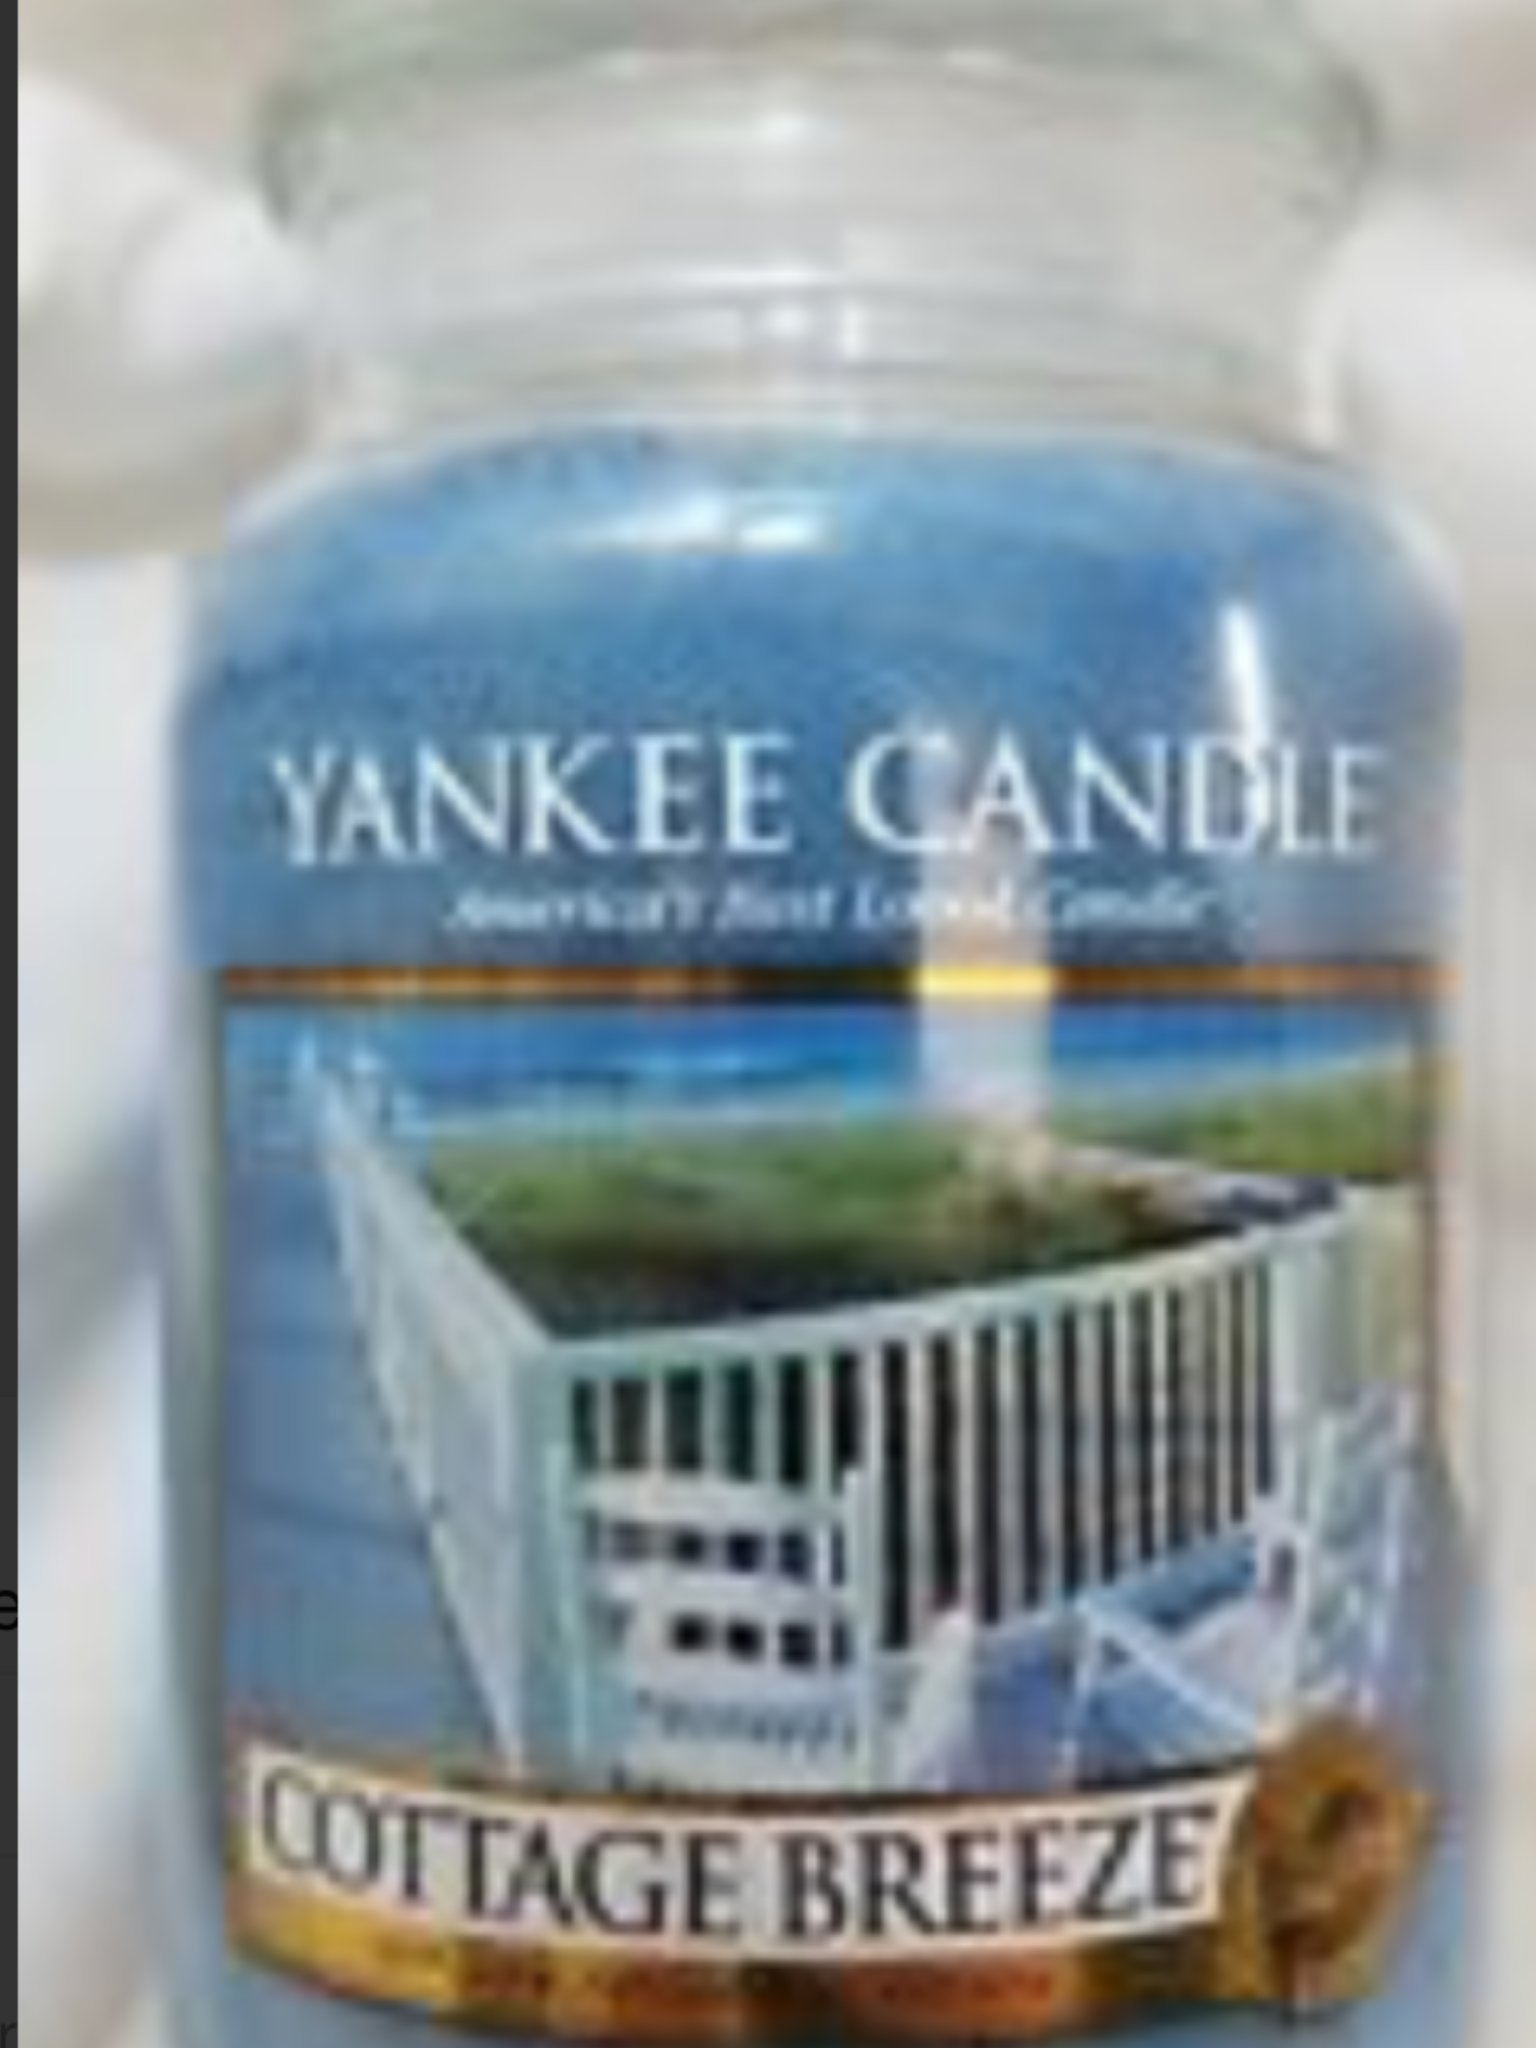 Yankee Candle - Yankee Candle Cottage Breeze Large Jar Candle